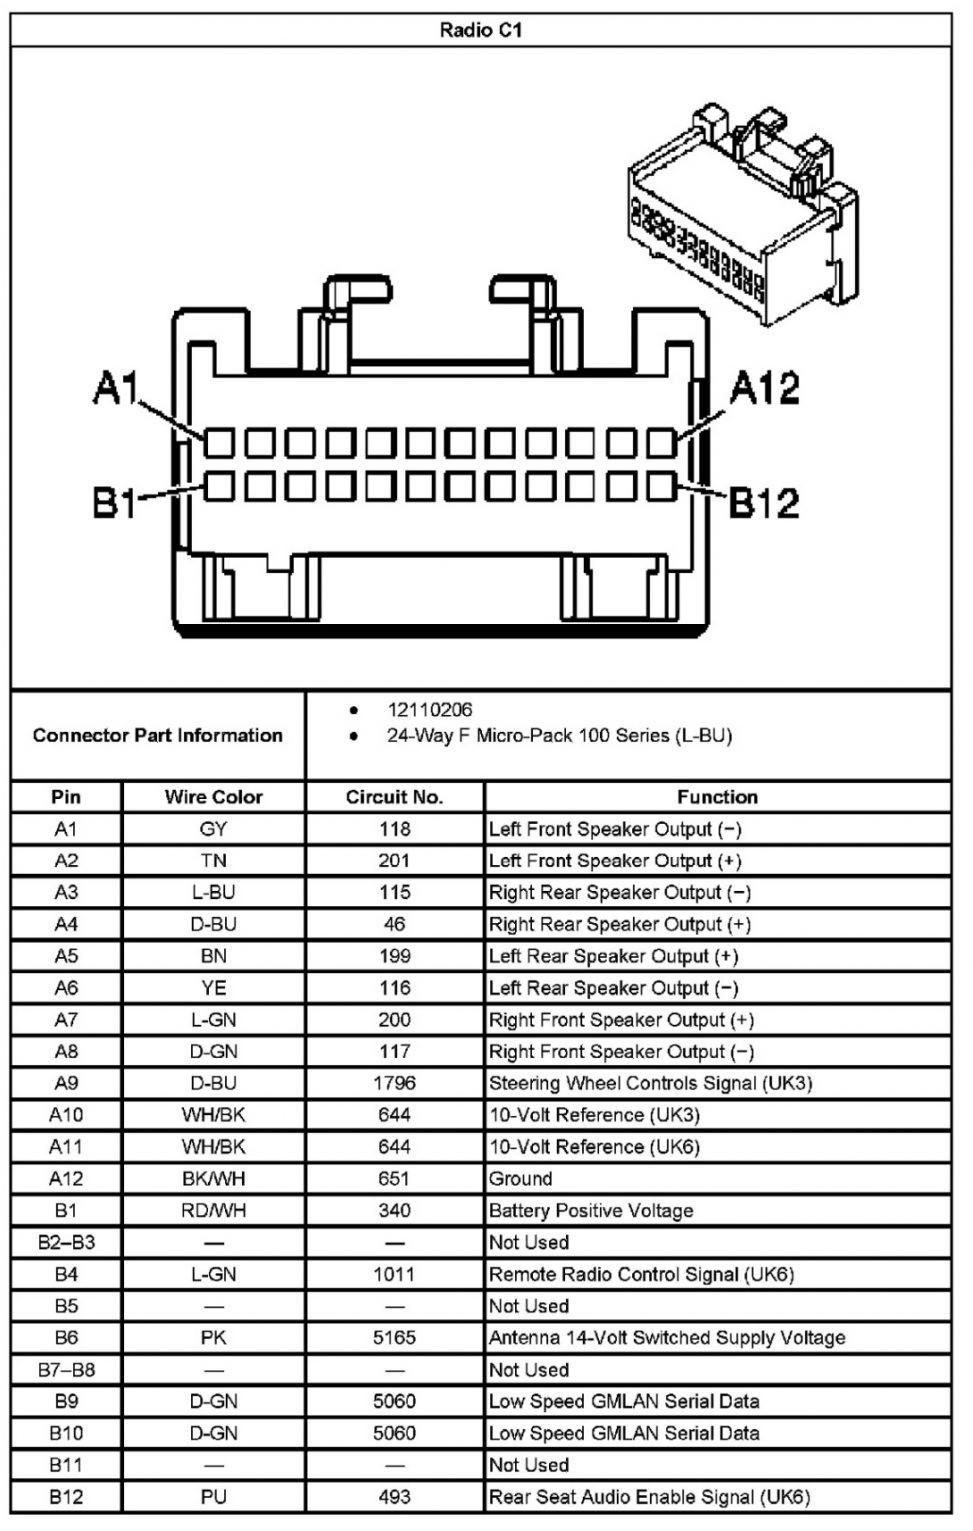 2004 Chevy Malibu Radio Wiring Diagram Free Wiring Diagram